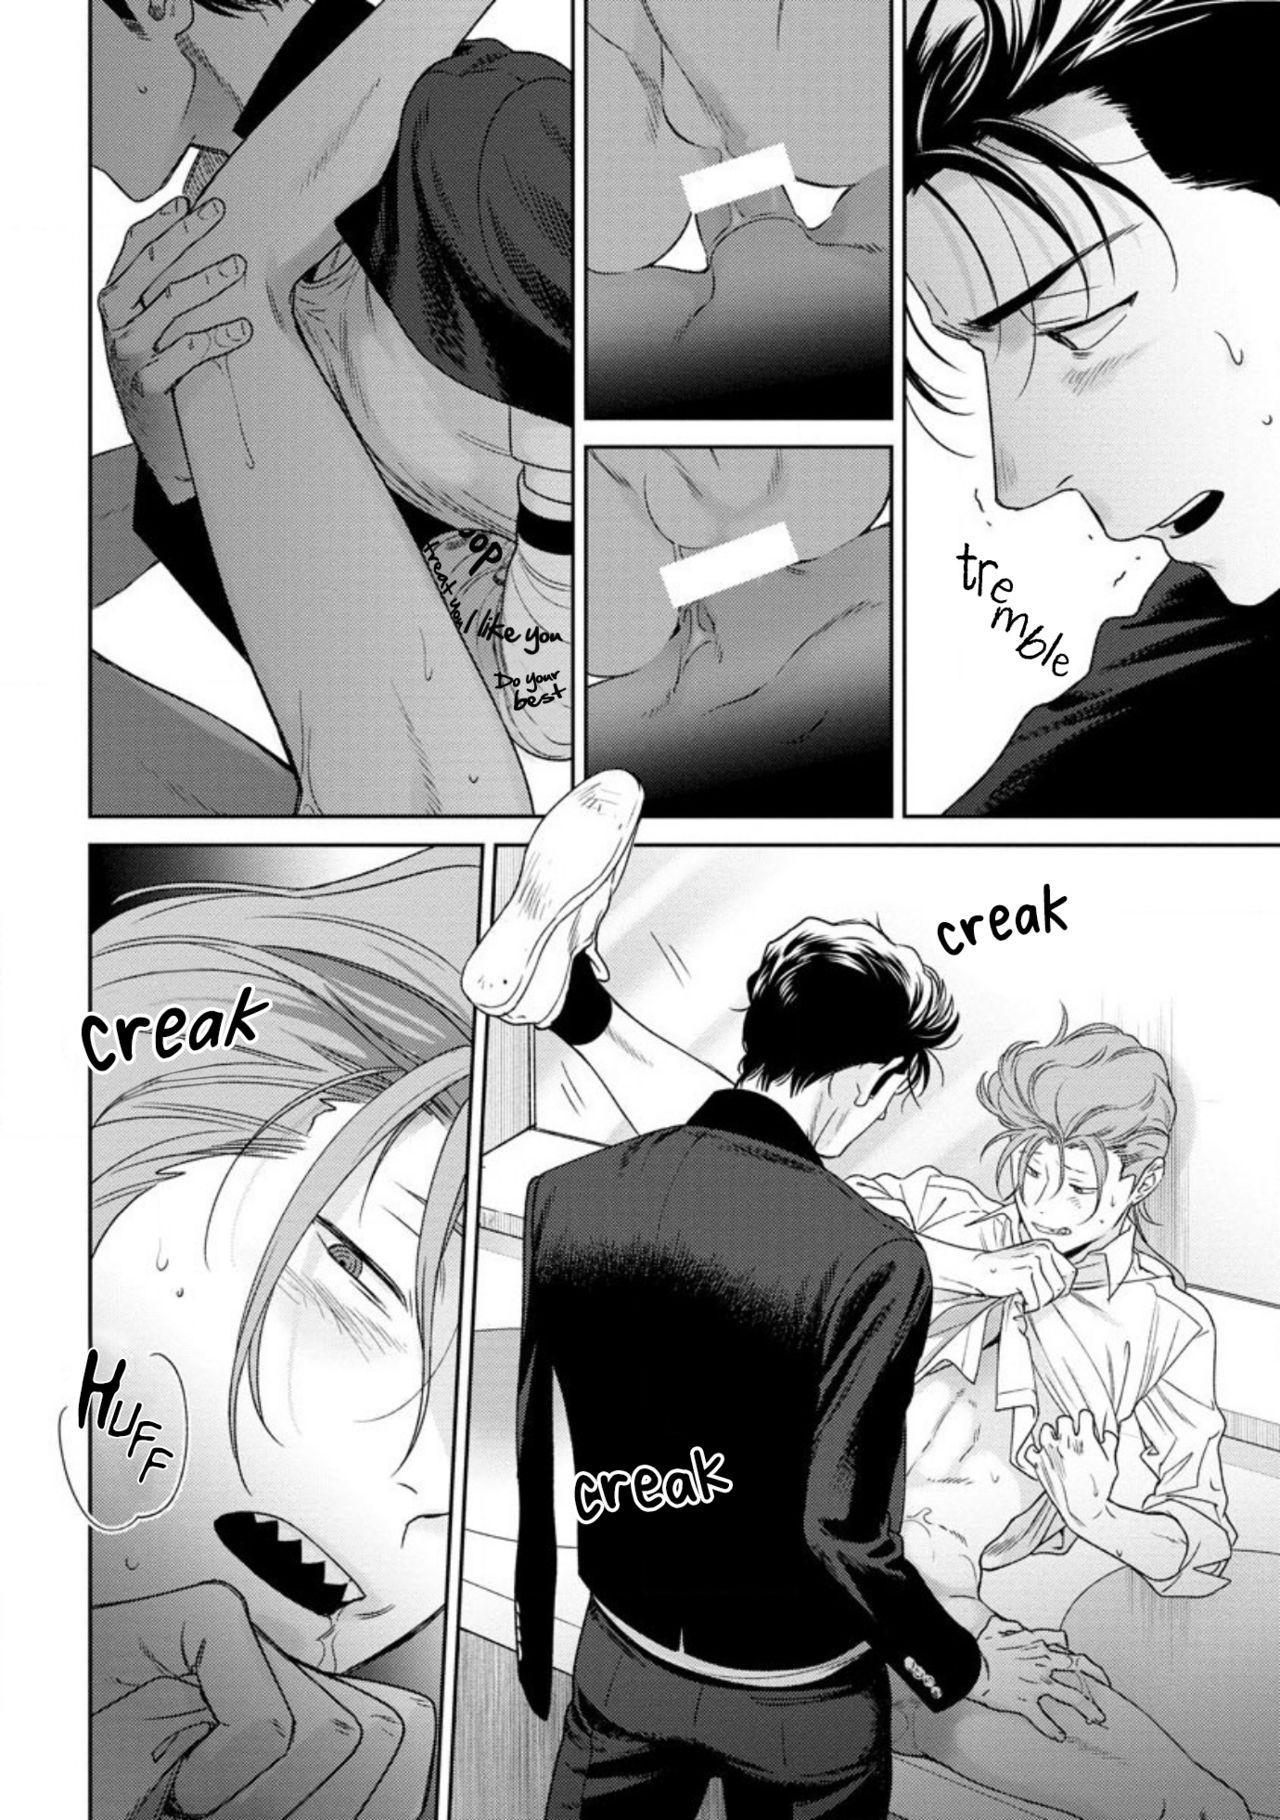 [Hiiragi Nozomu] Nakasete Yaru yo Yankee-kun   I'll Make You Cry Ch. 1-5 + Extras [English] [Digital] 182